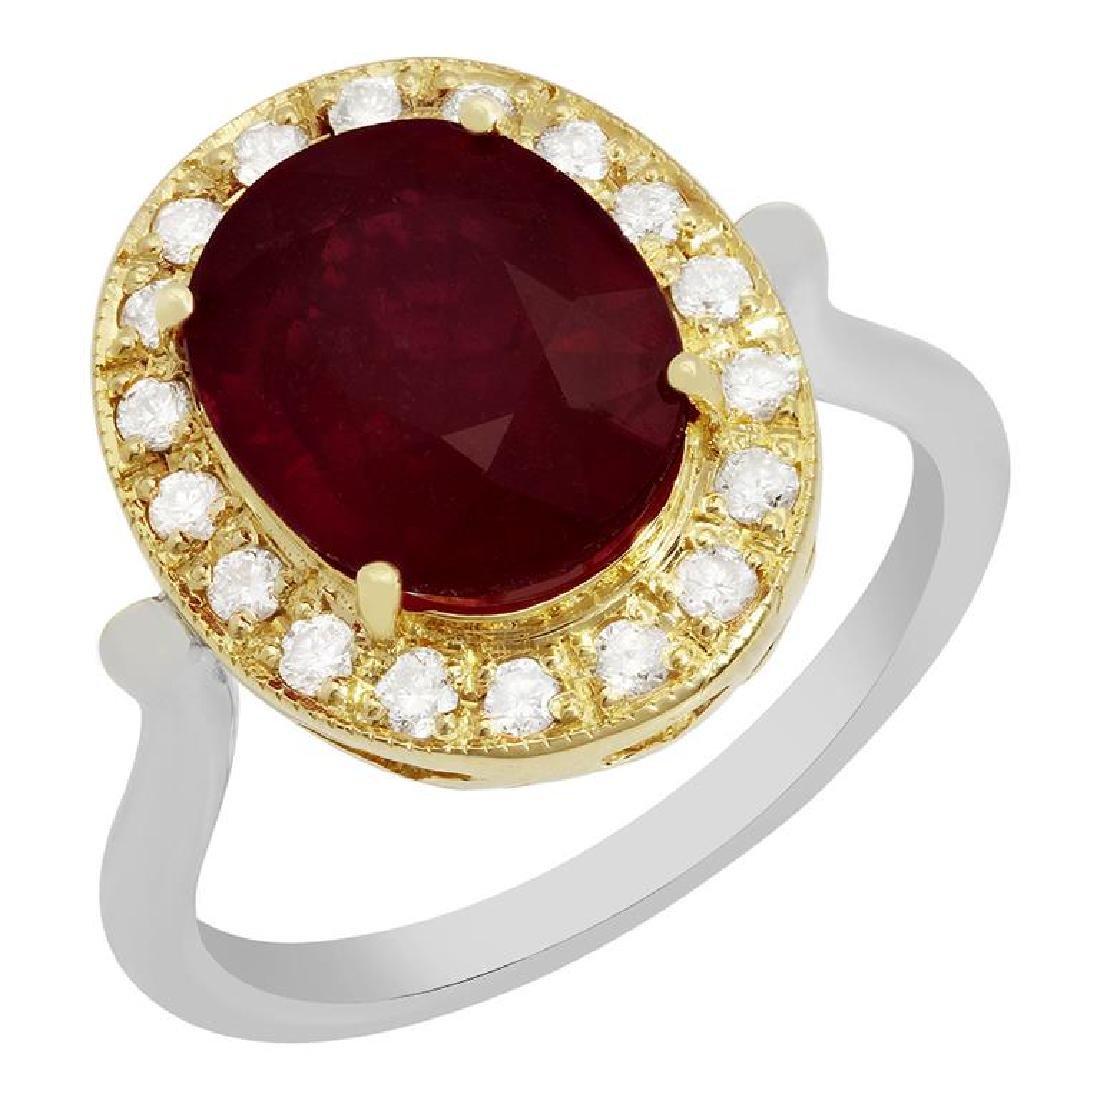 14k Yellow & White Gold 5.50ct Ruby 0.42ct Diamond Ring